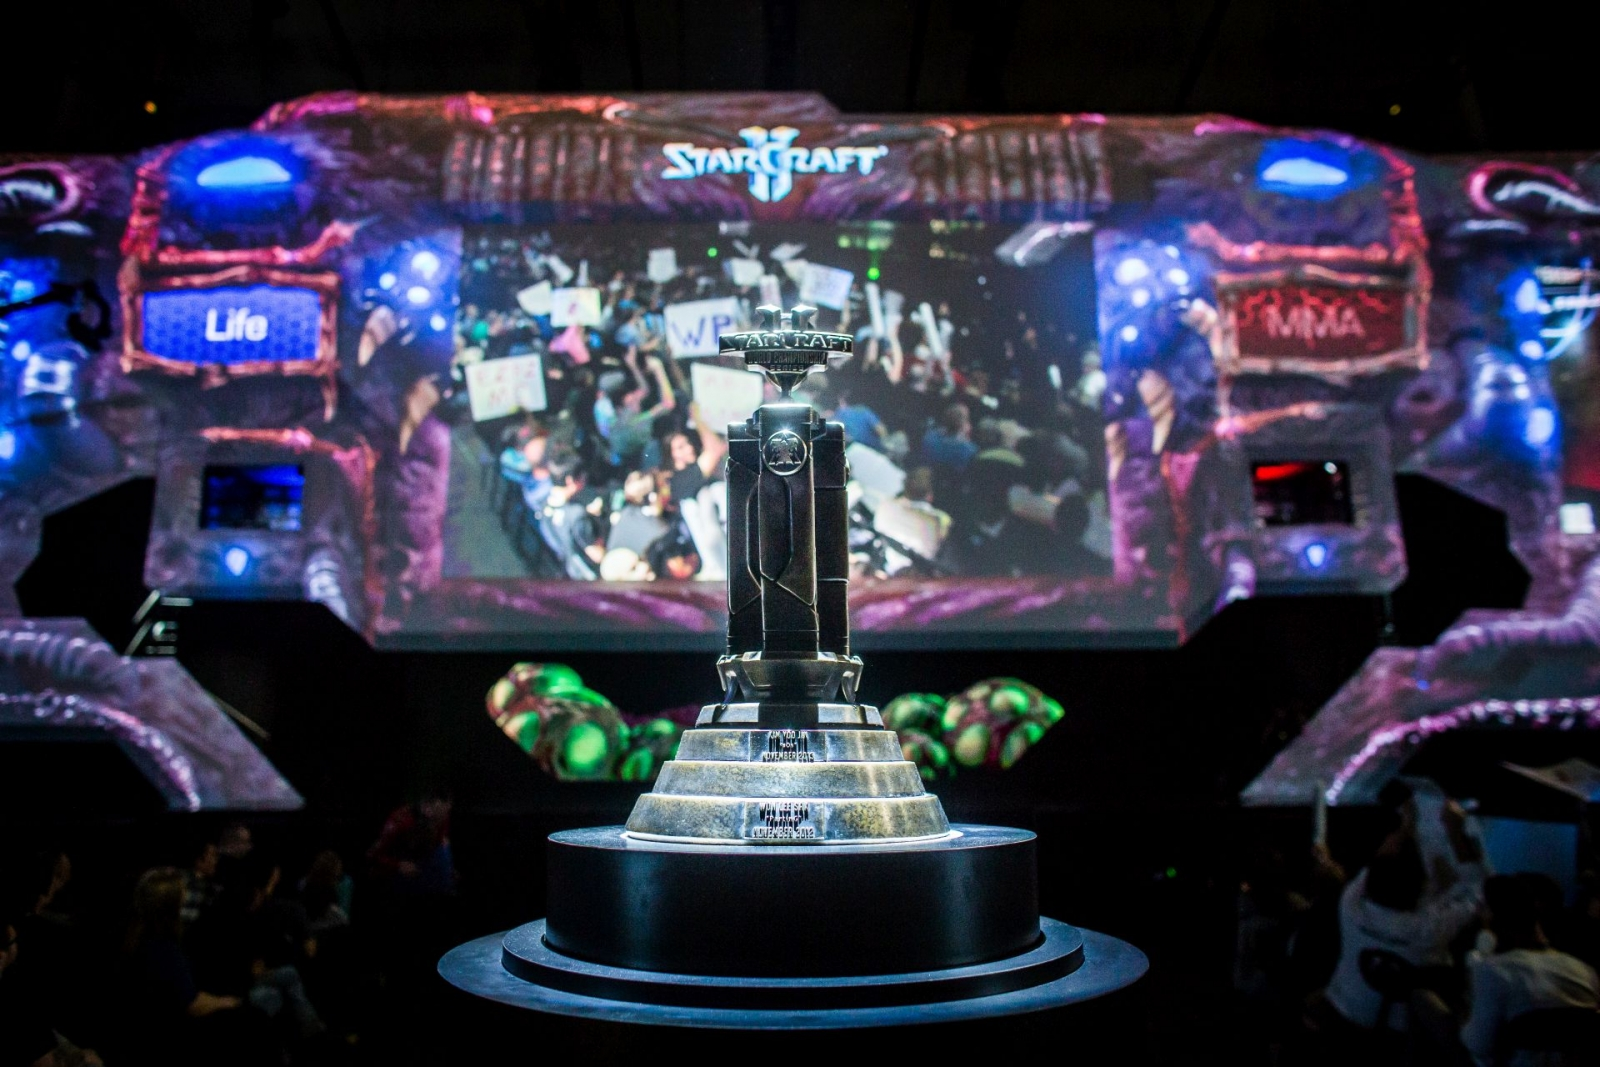 Blizzcon 2014 Starcraft 2 World Championship Series trophy on display